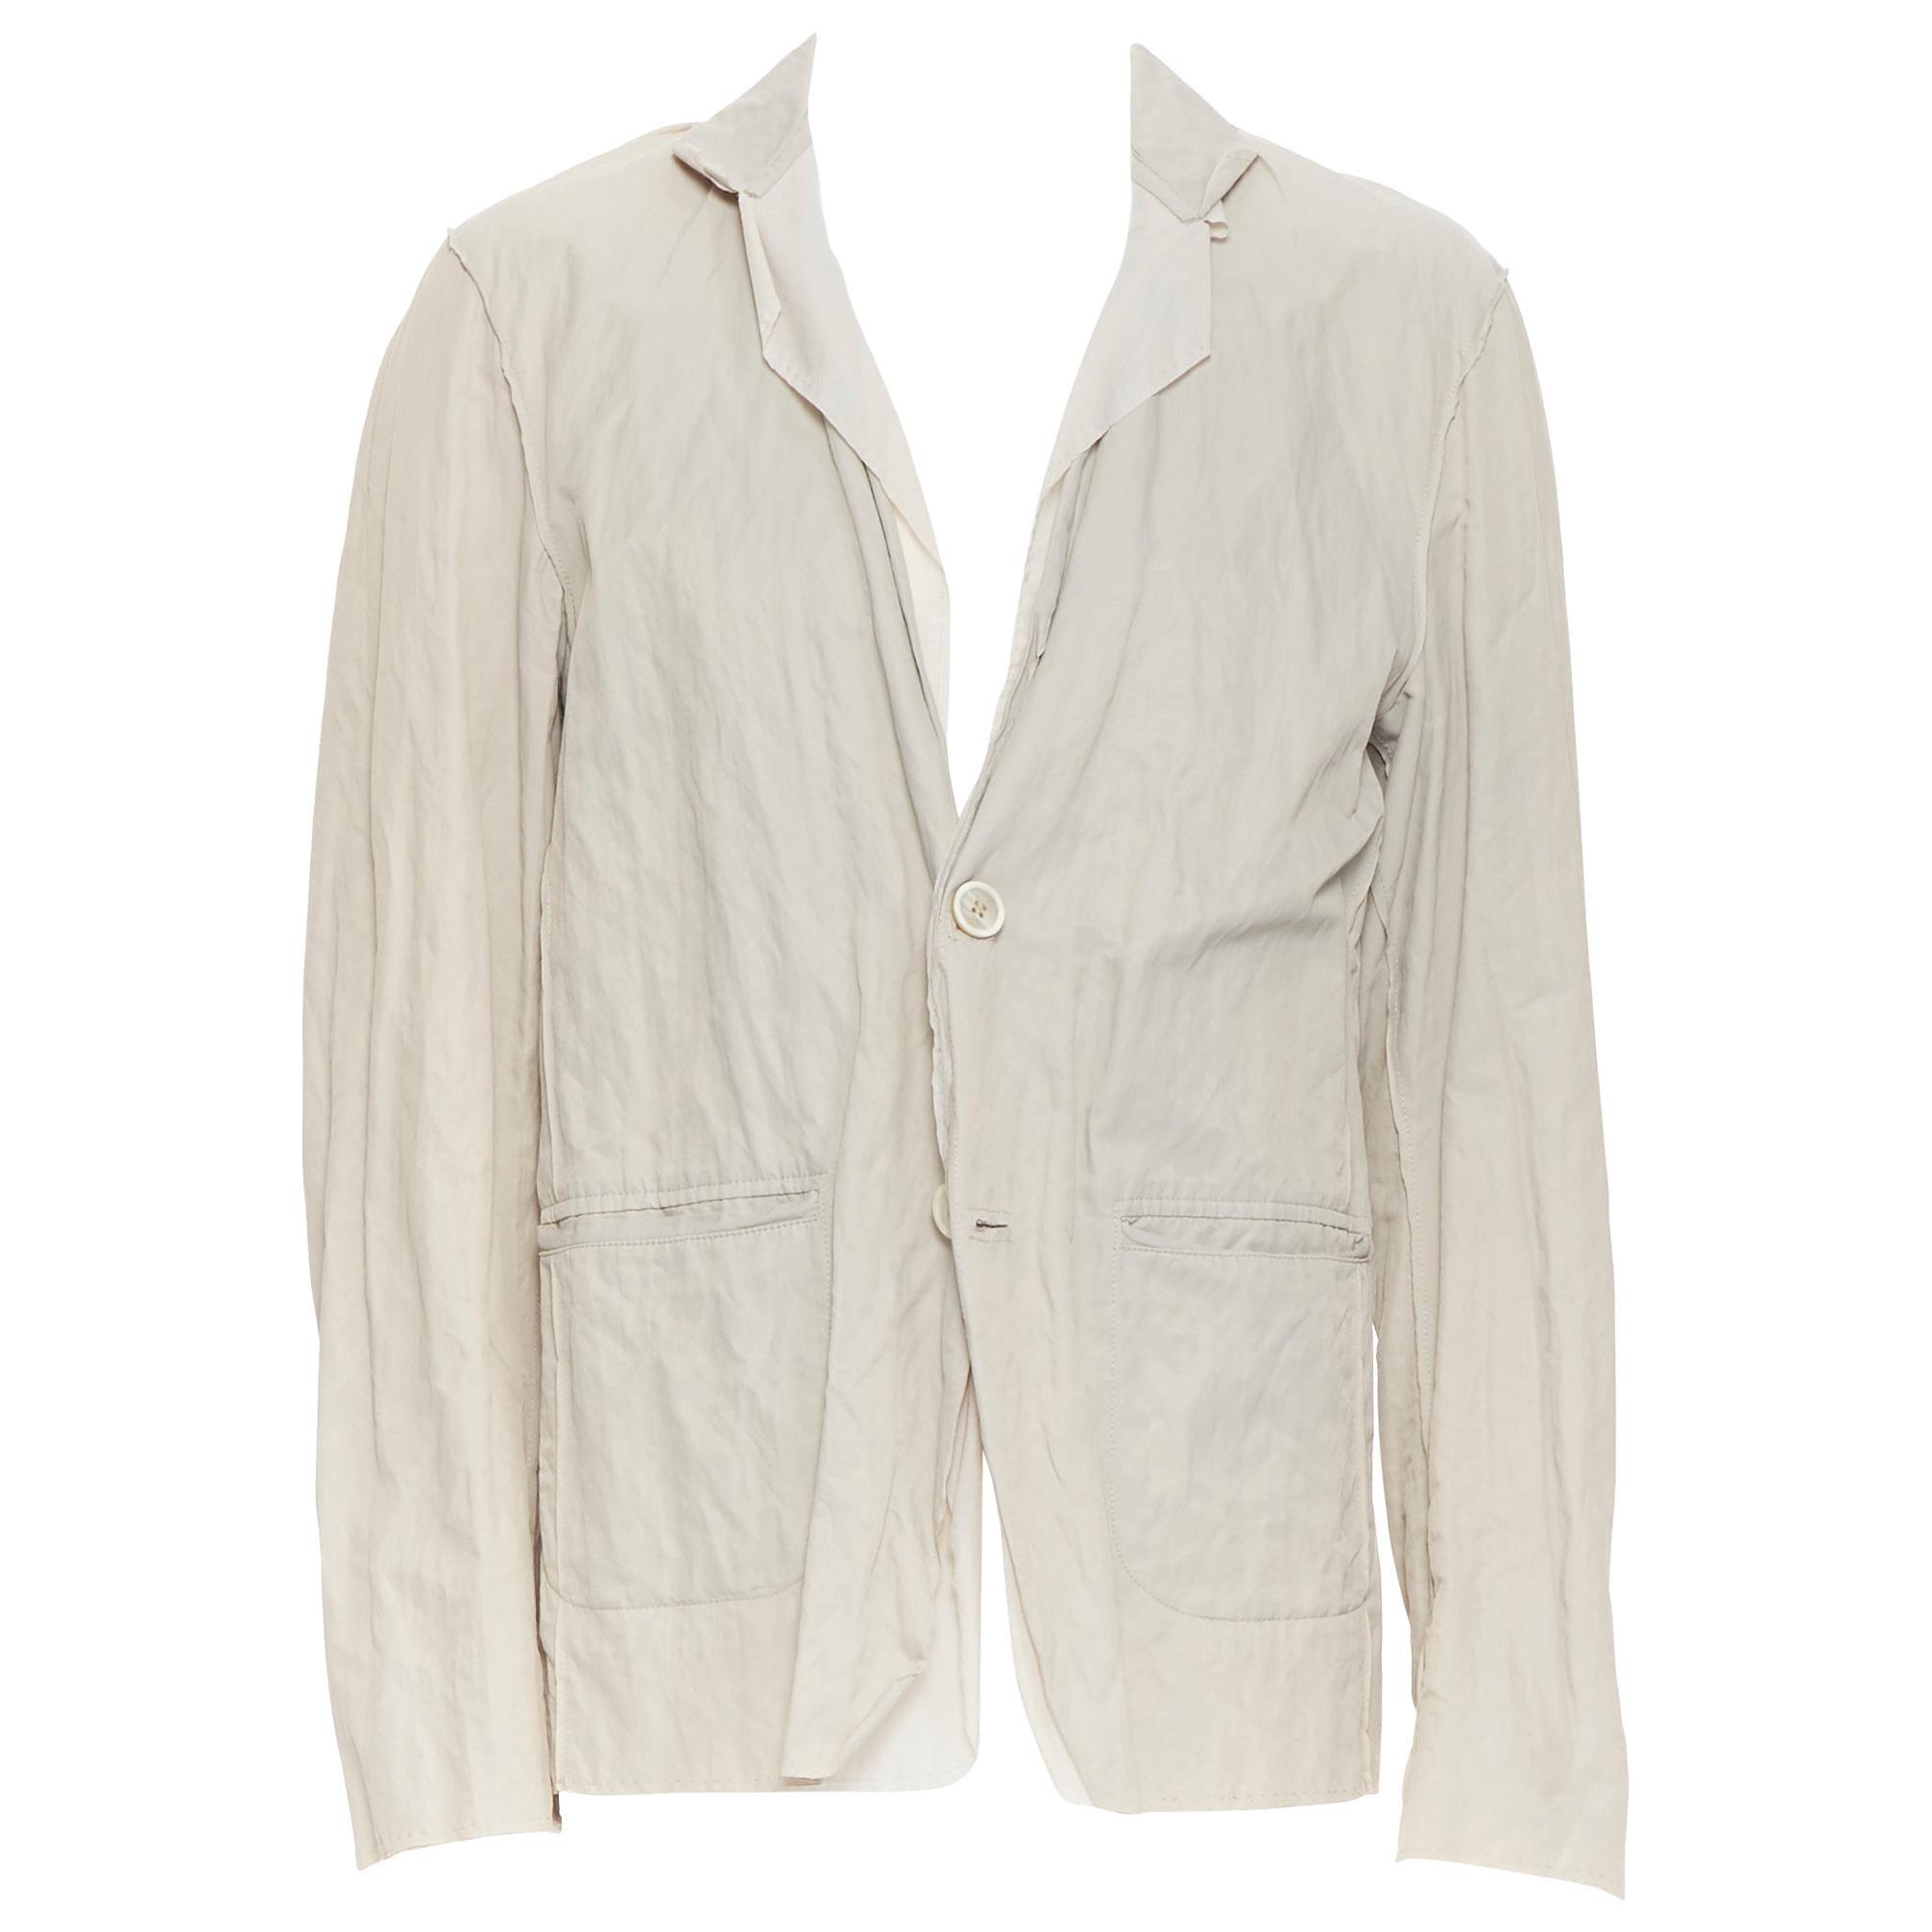 LANVIN Runway light stone coated cotton raw seam summer blazer jacket EU50 L